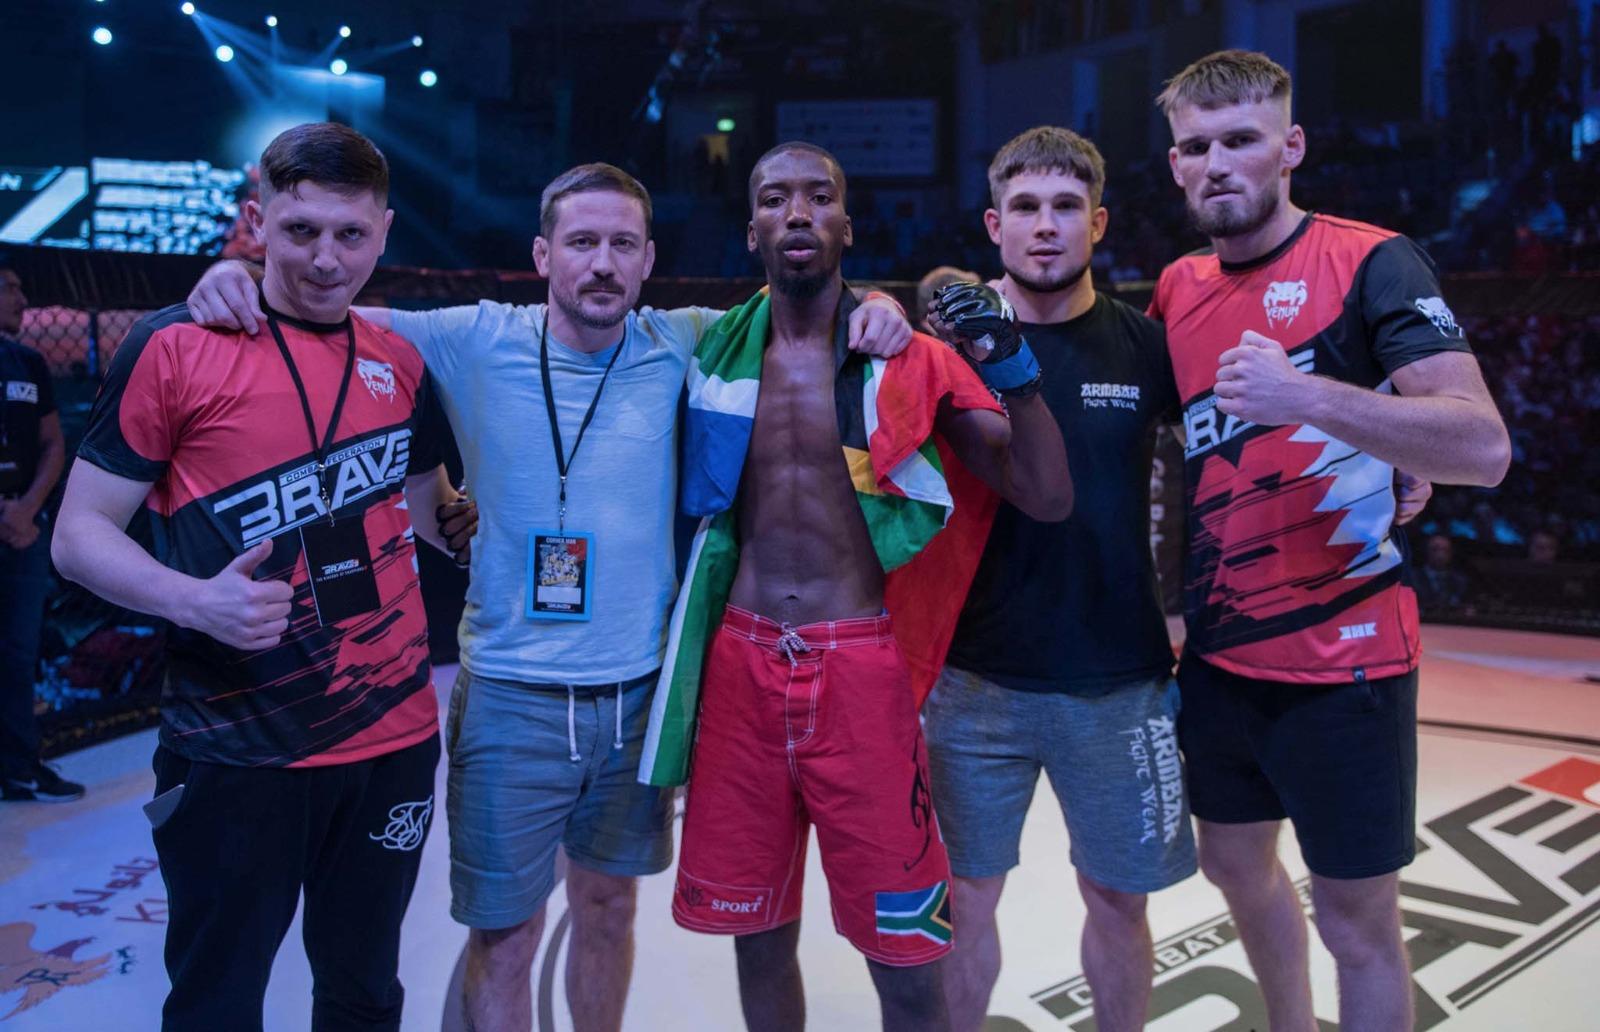 John Kavanagh praises Mlambo's commitment ahead of Brave title fight